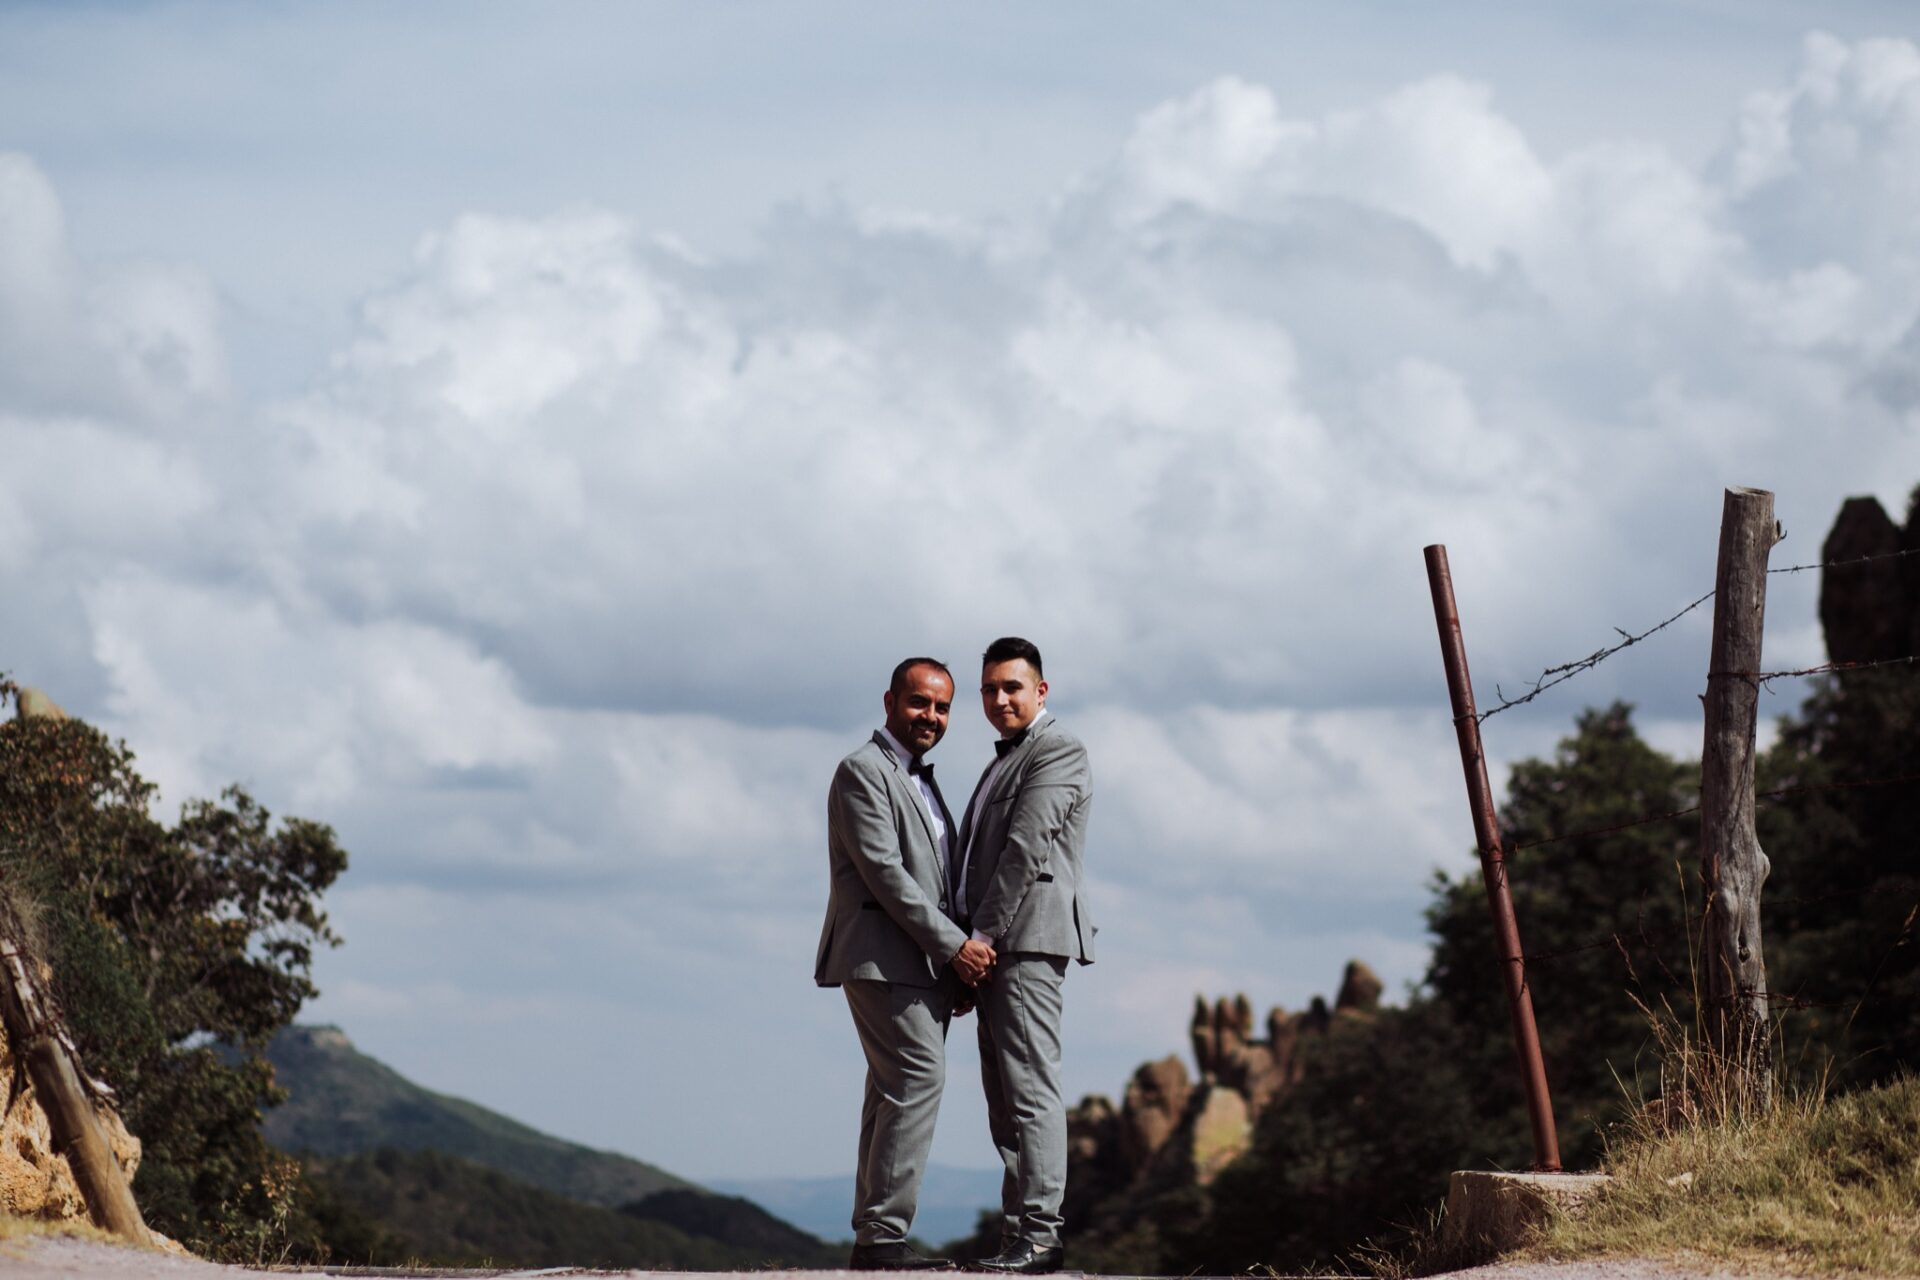 javier_noriega_fotografo_bodas_save_the_date_preboda_zacatecas_wedding_photographer4